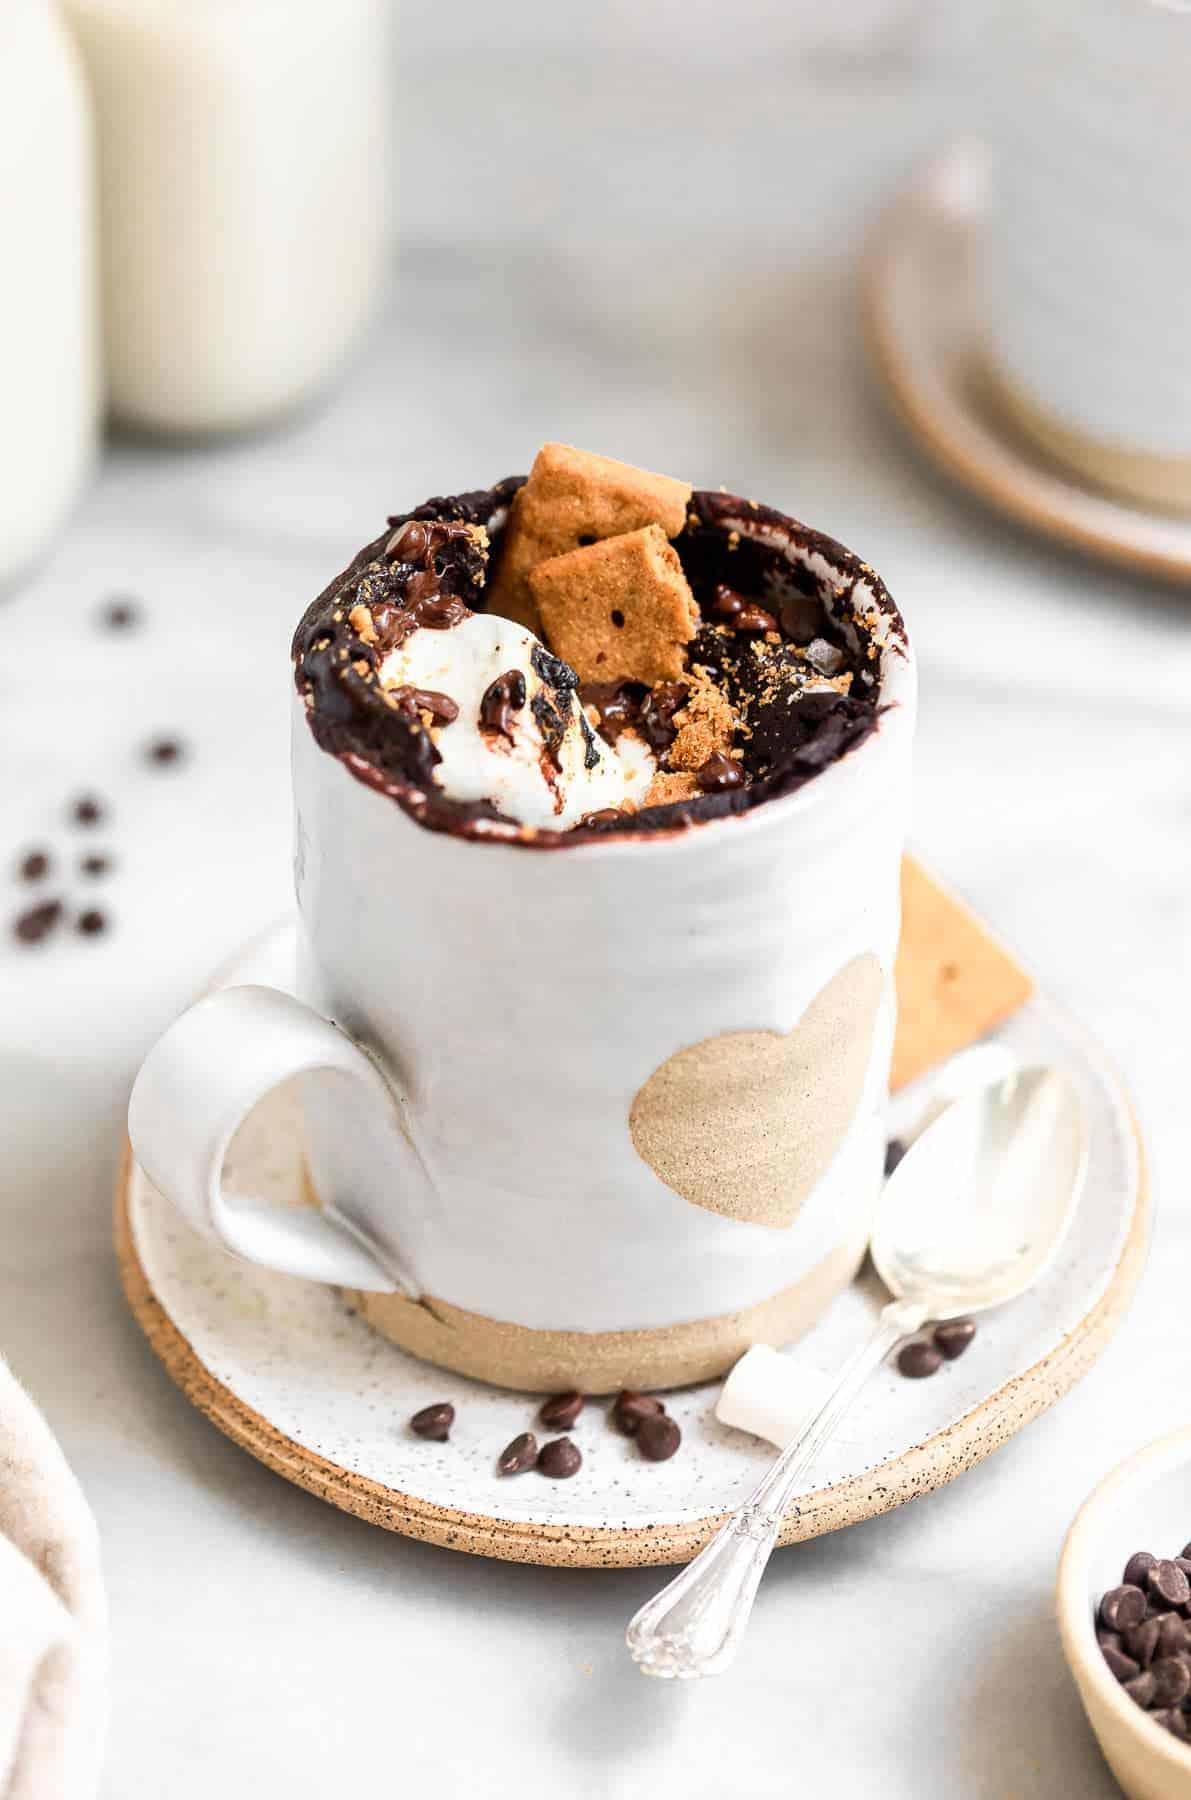 Gluten free chocolate mug cake with marshamallows.